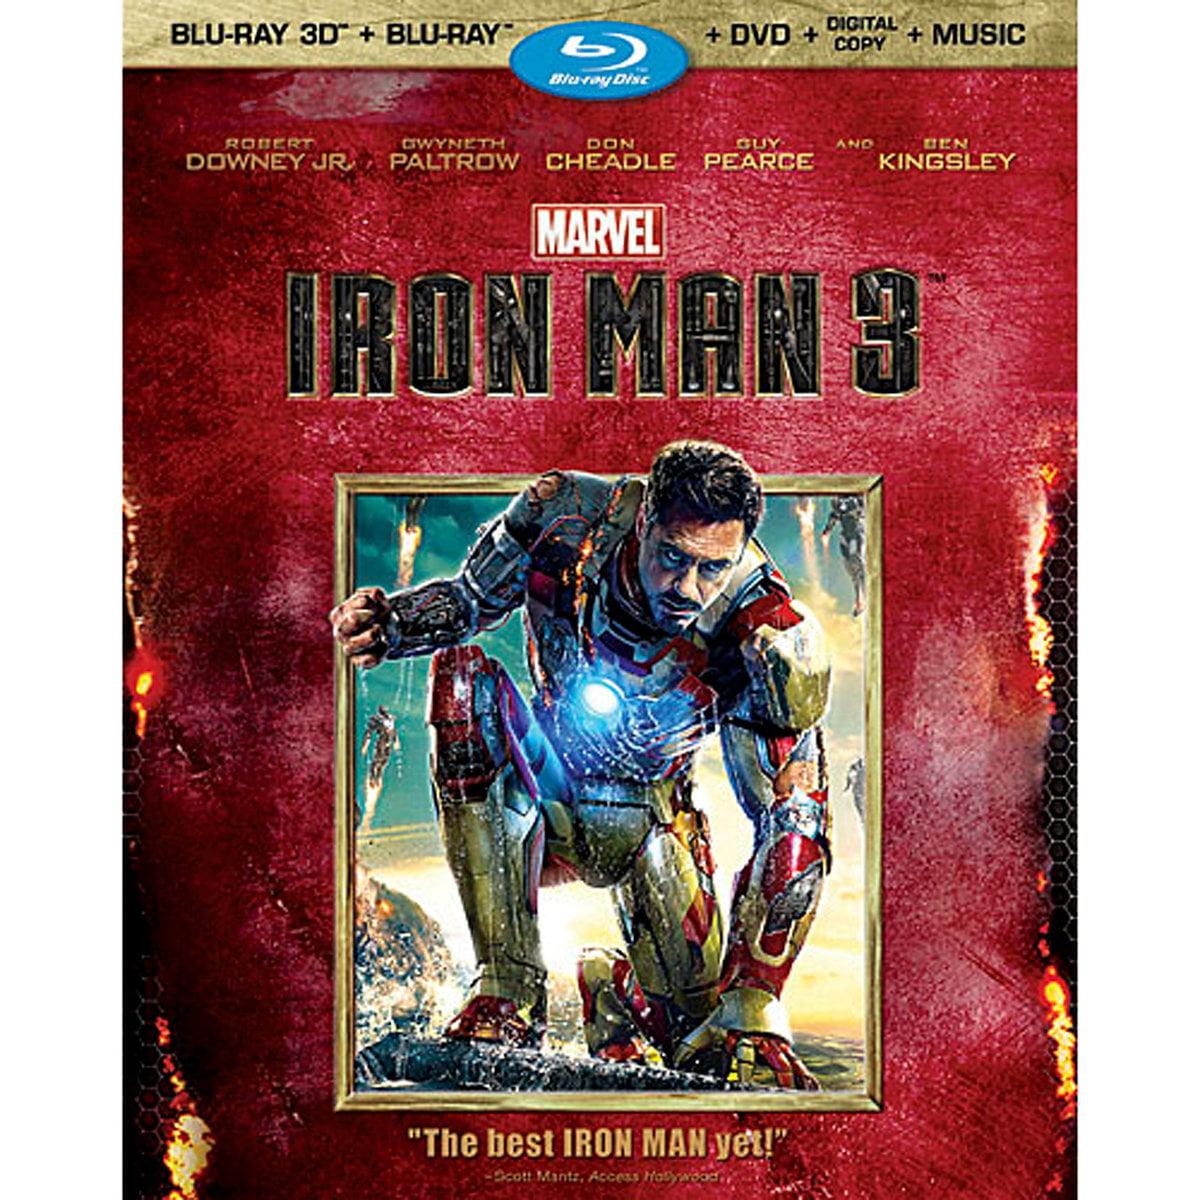 Iron Man 3 (Blu-ray 3D + Blu-ray + DVD + Digital Copy + Music)